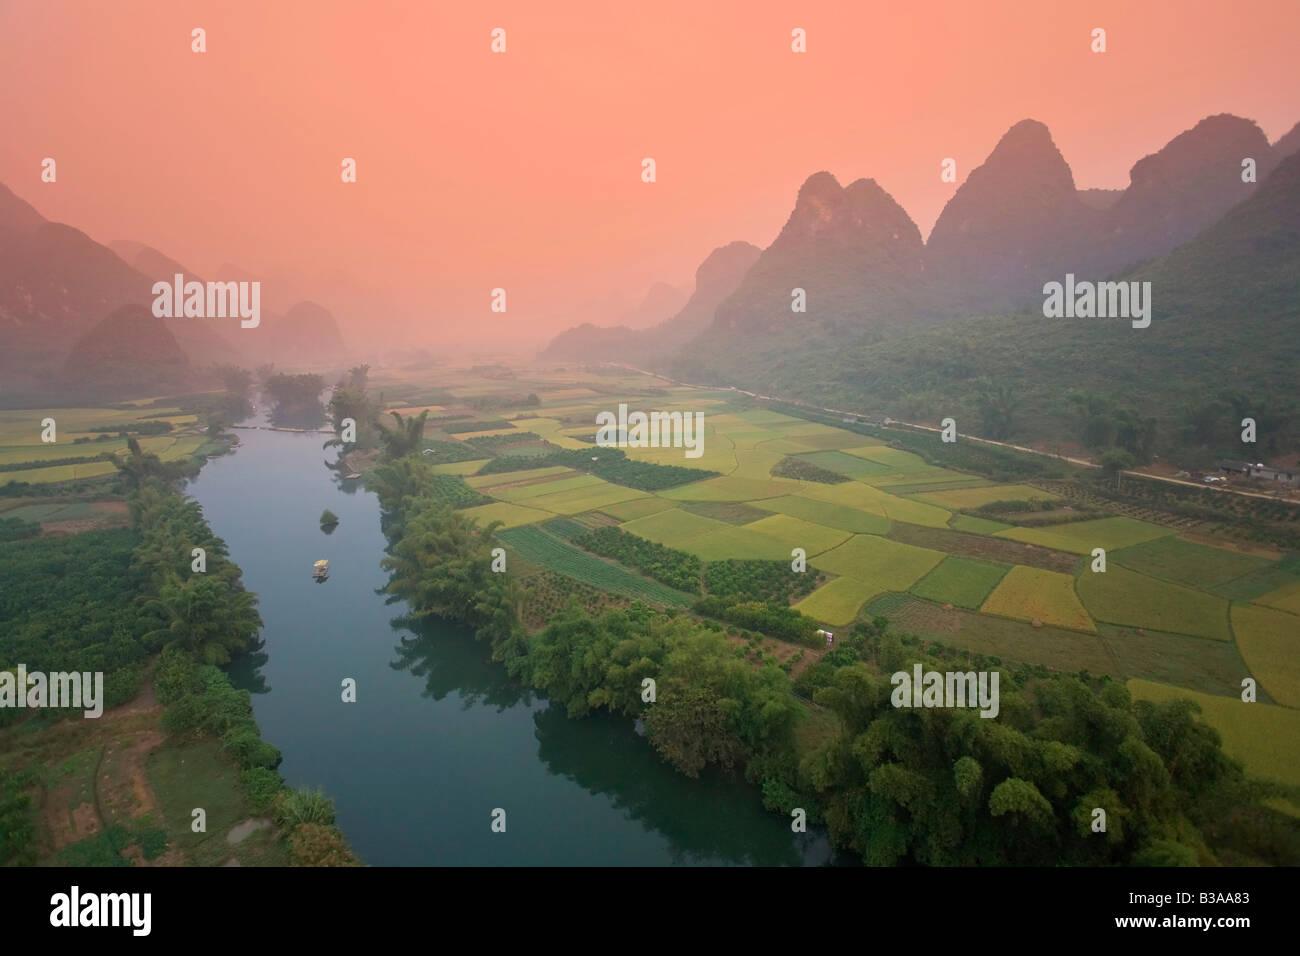 Karst-Berg-Landschaft & Li-Fluss von Heißluftballon, Yangshuo, Guilin, Provinz Guangxi, China Stockfoto